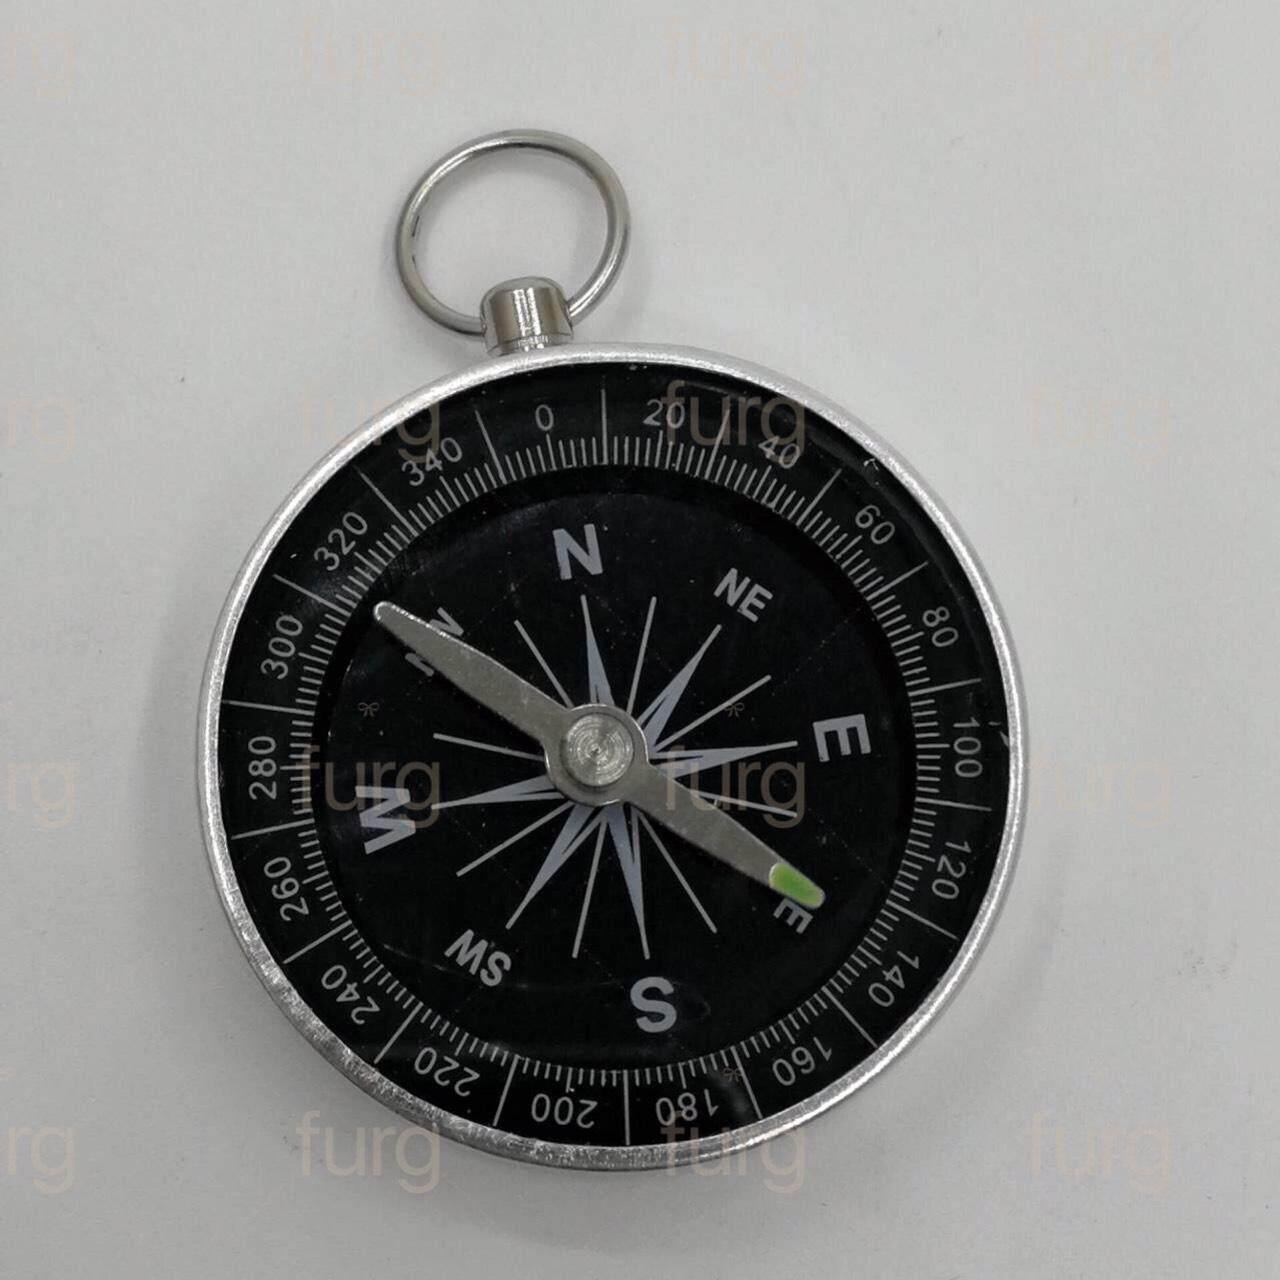 Everdayitems เข็มทิศ Compass เข็มทิศนำทาง บอกทิศทางแม่นยำ By Everdayitems.